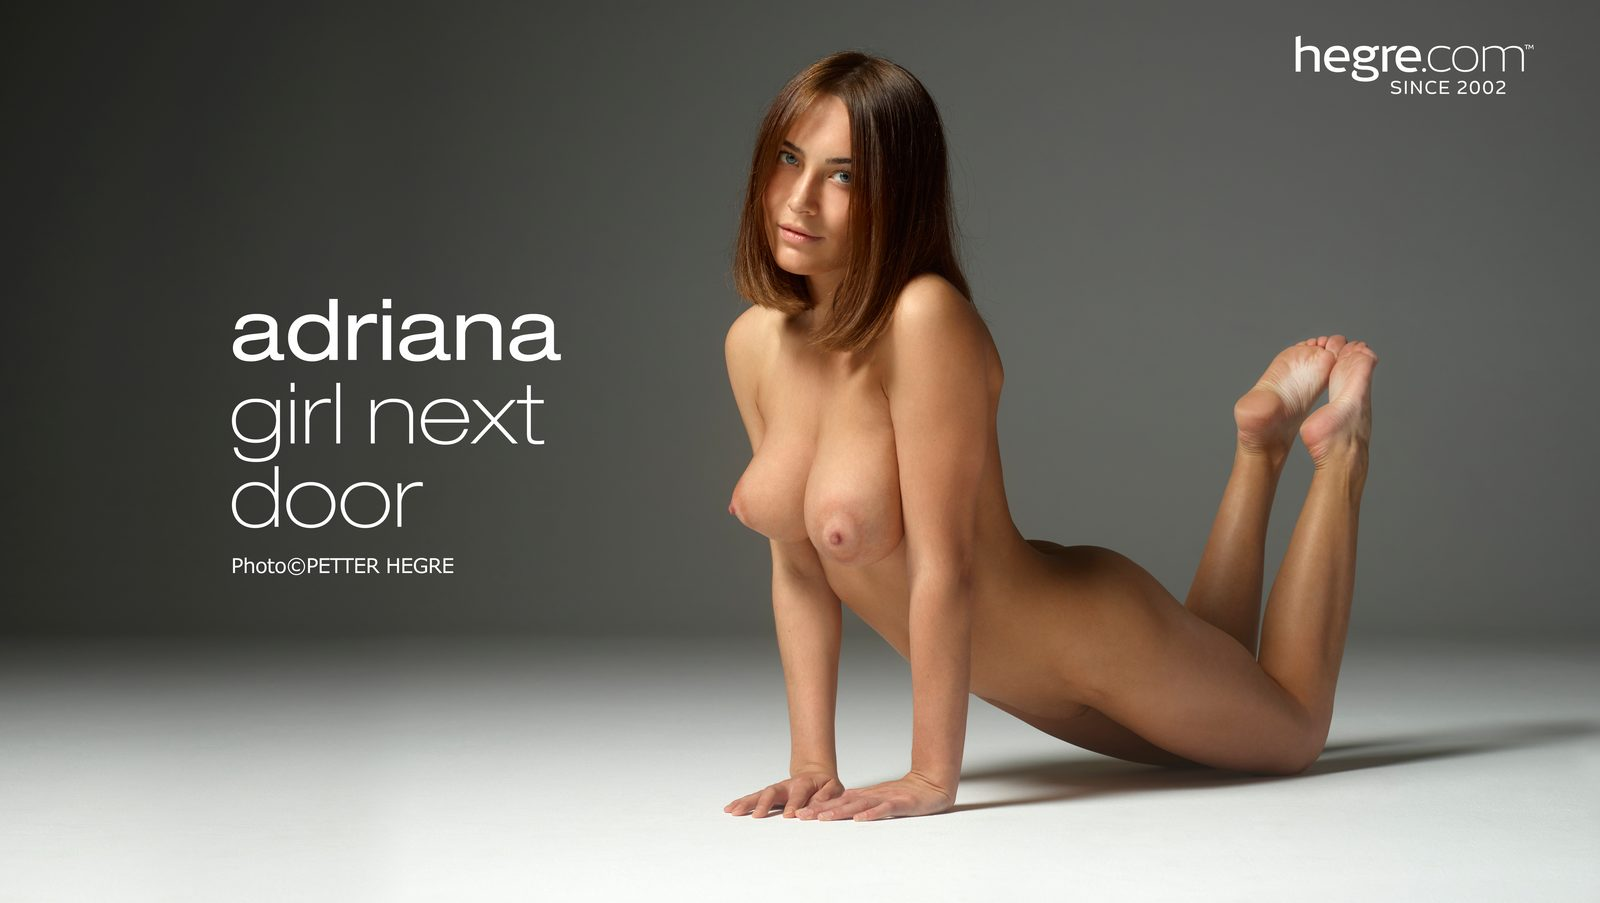 adrianna nextdoor models